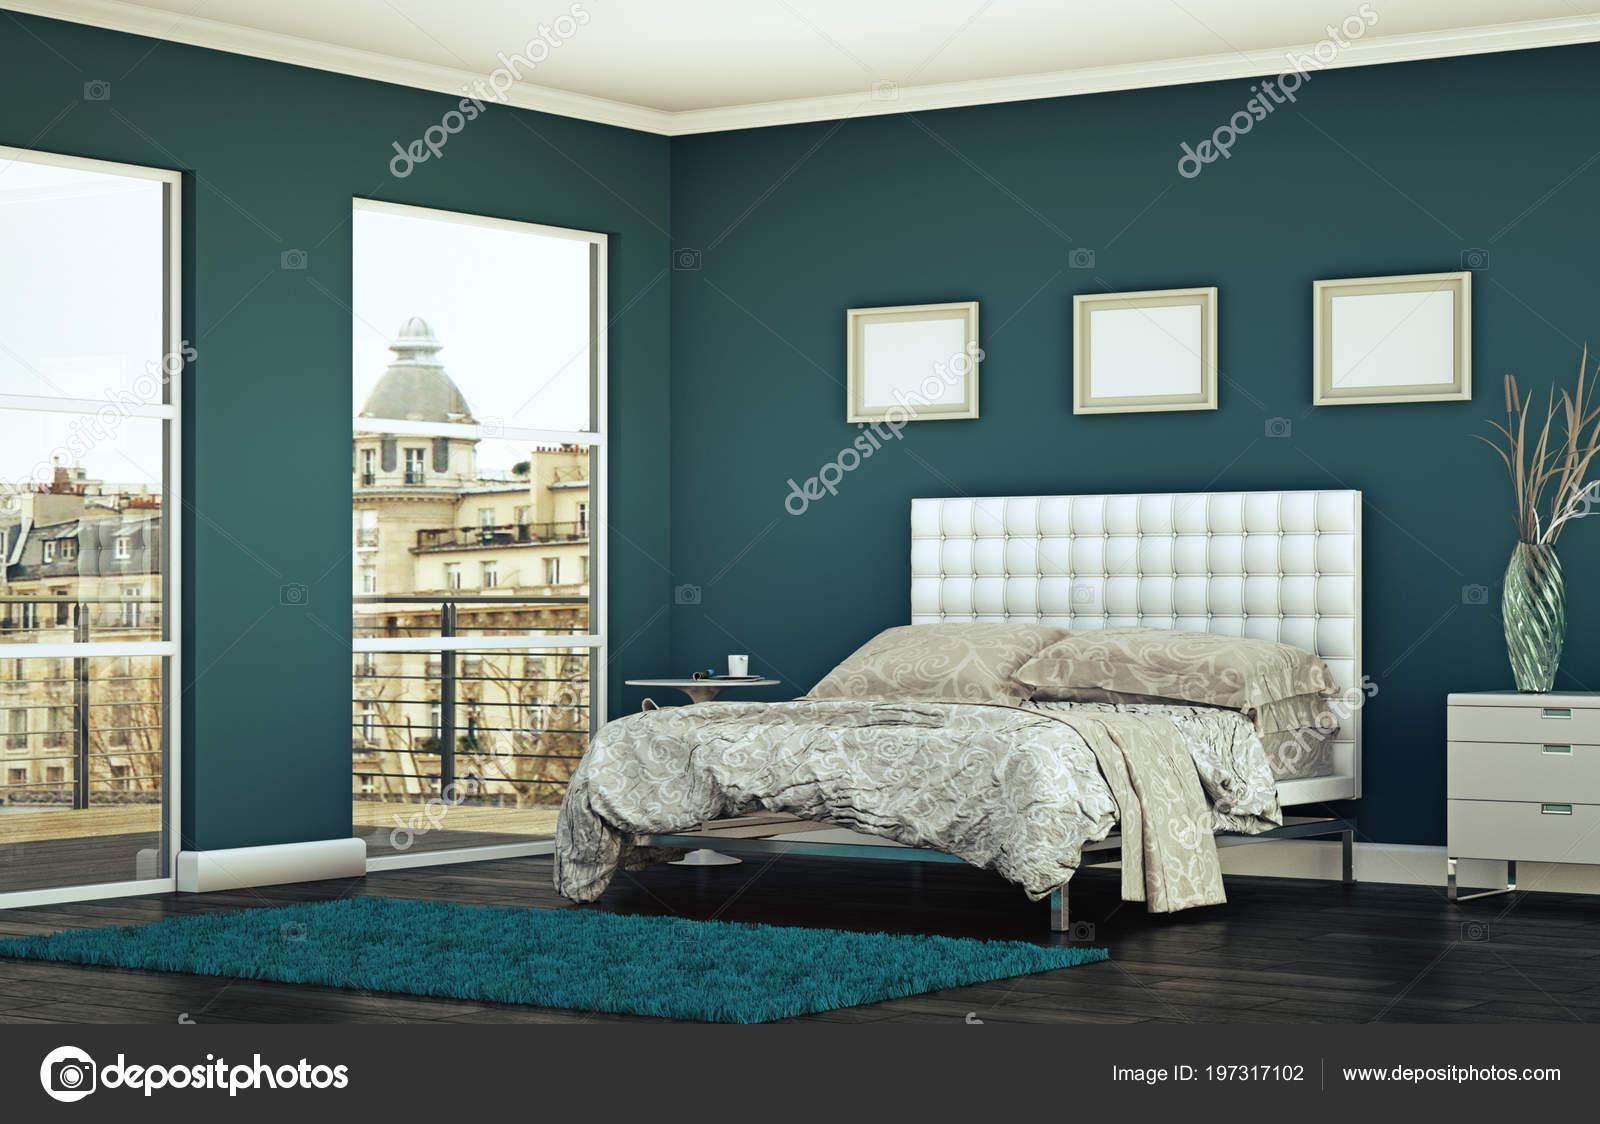 Camera da letto moderna con arredamento moderno e parete blu ...